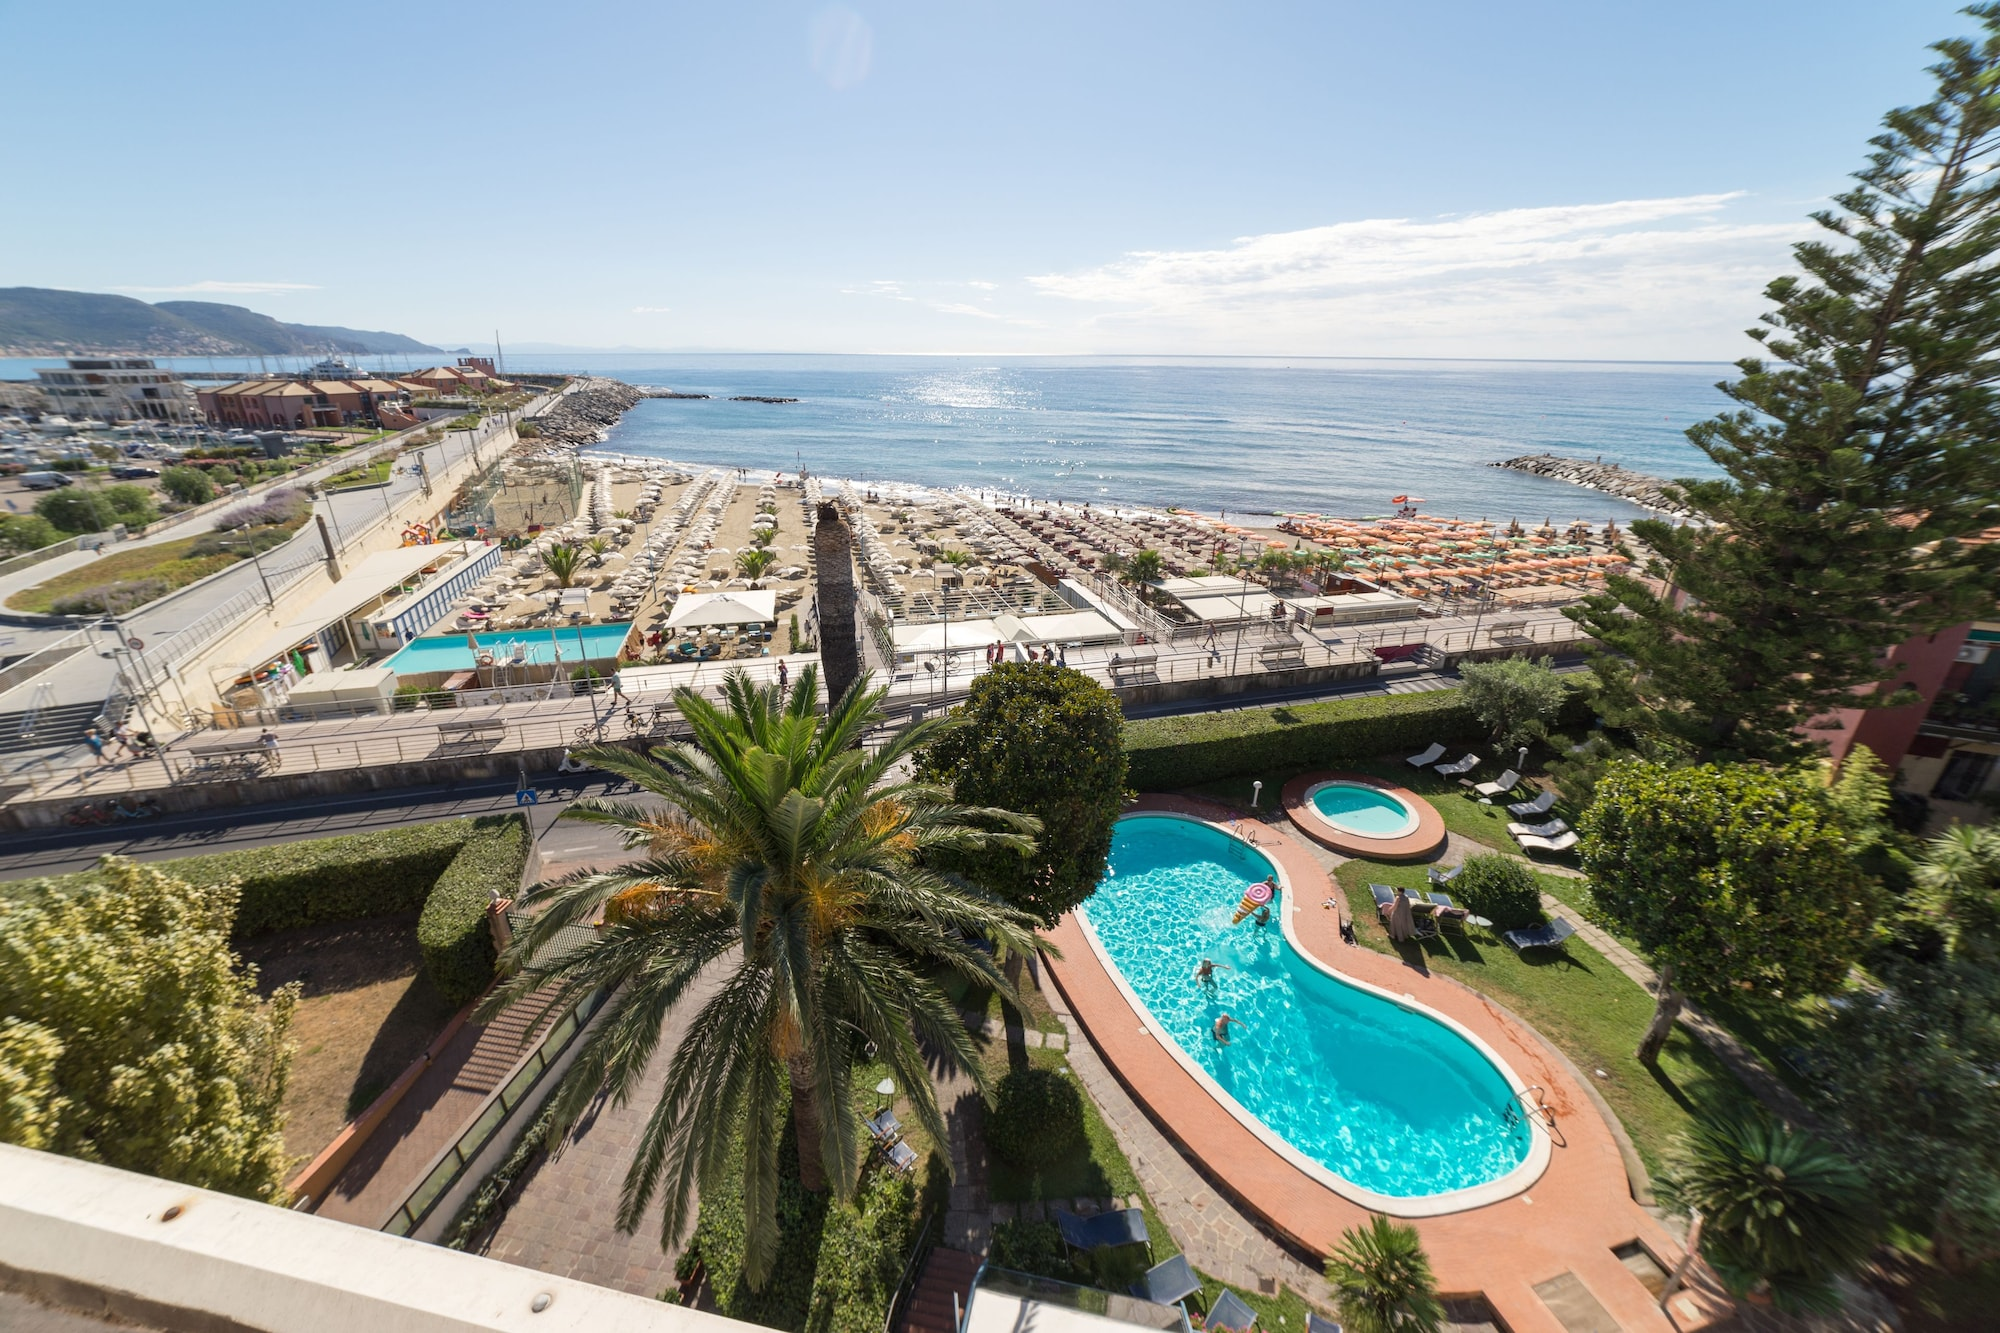 Hotel Garden Lido, Savona